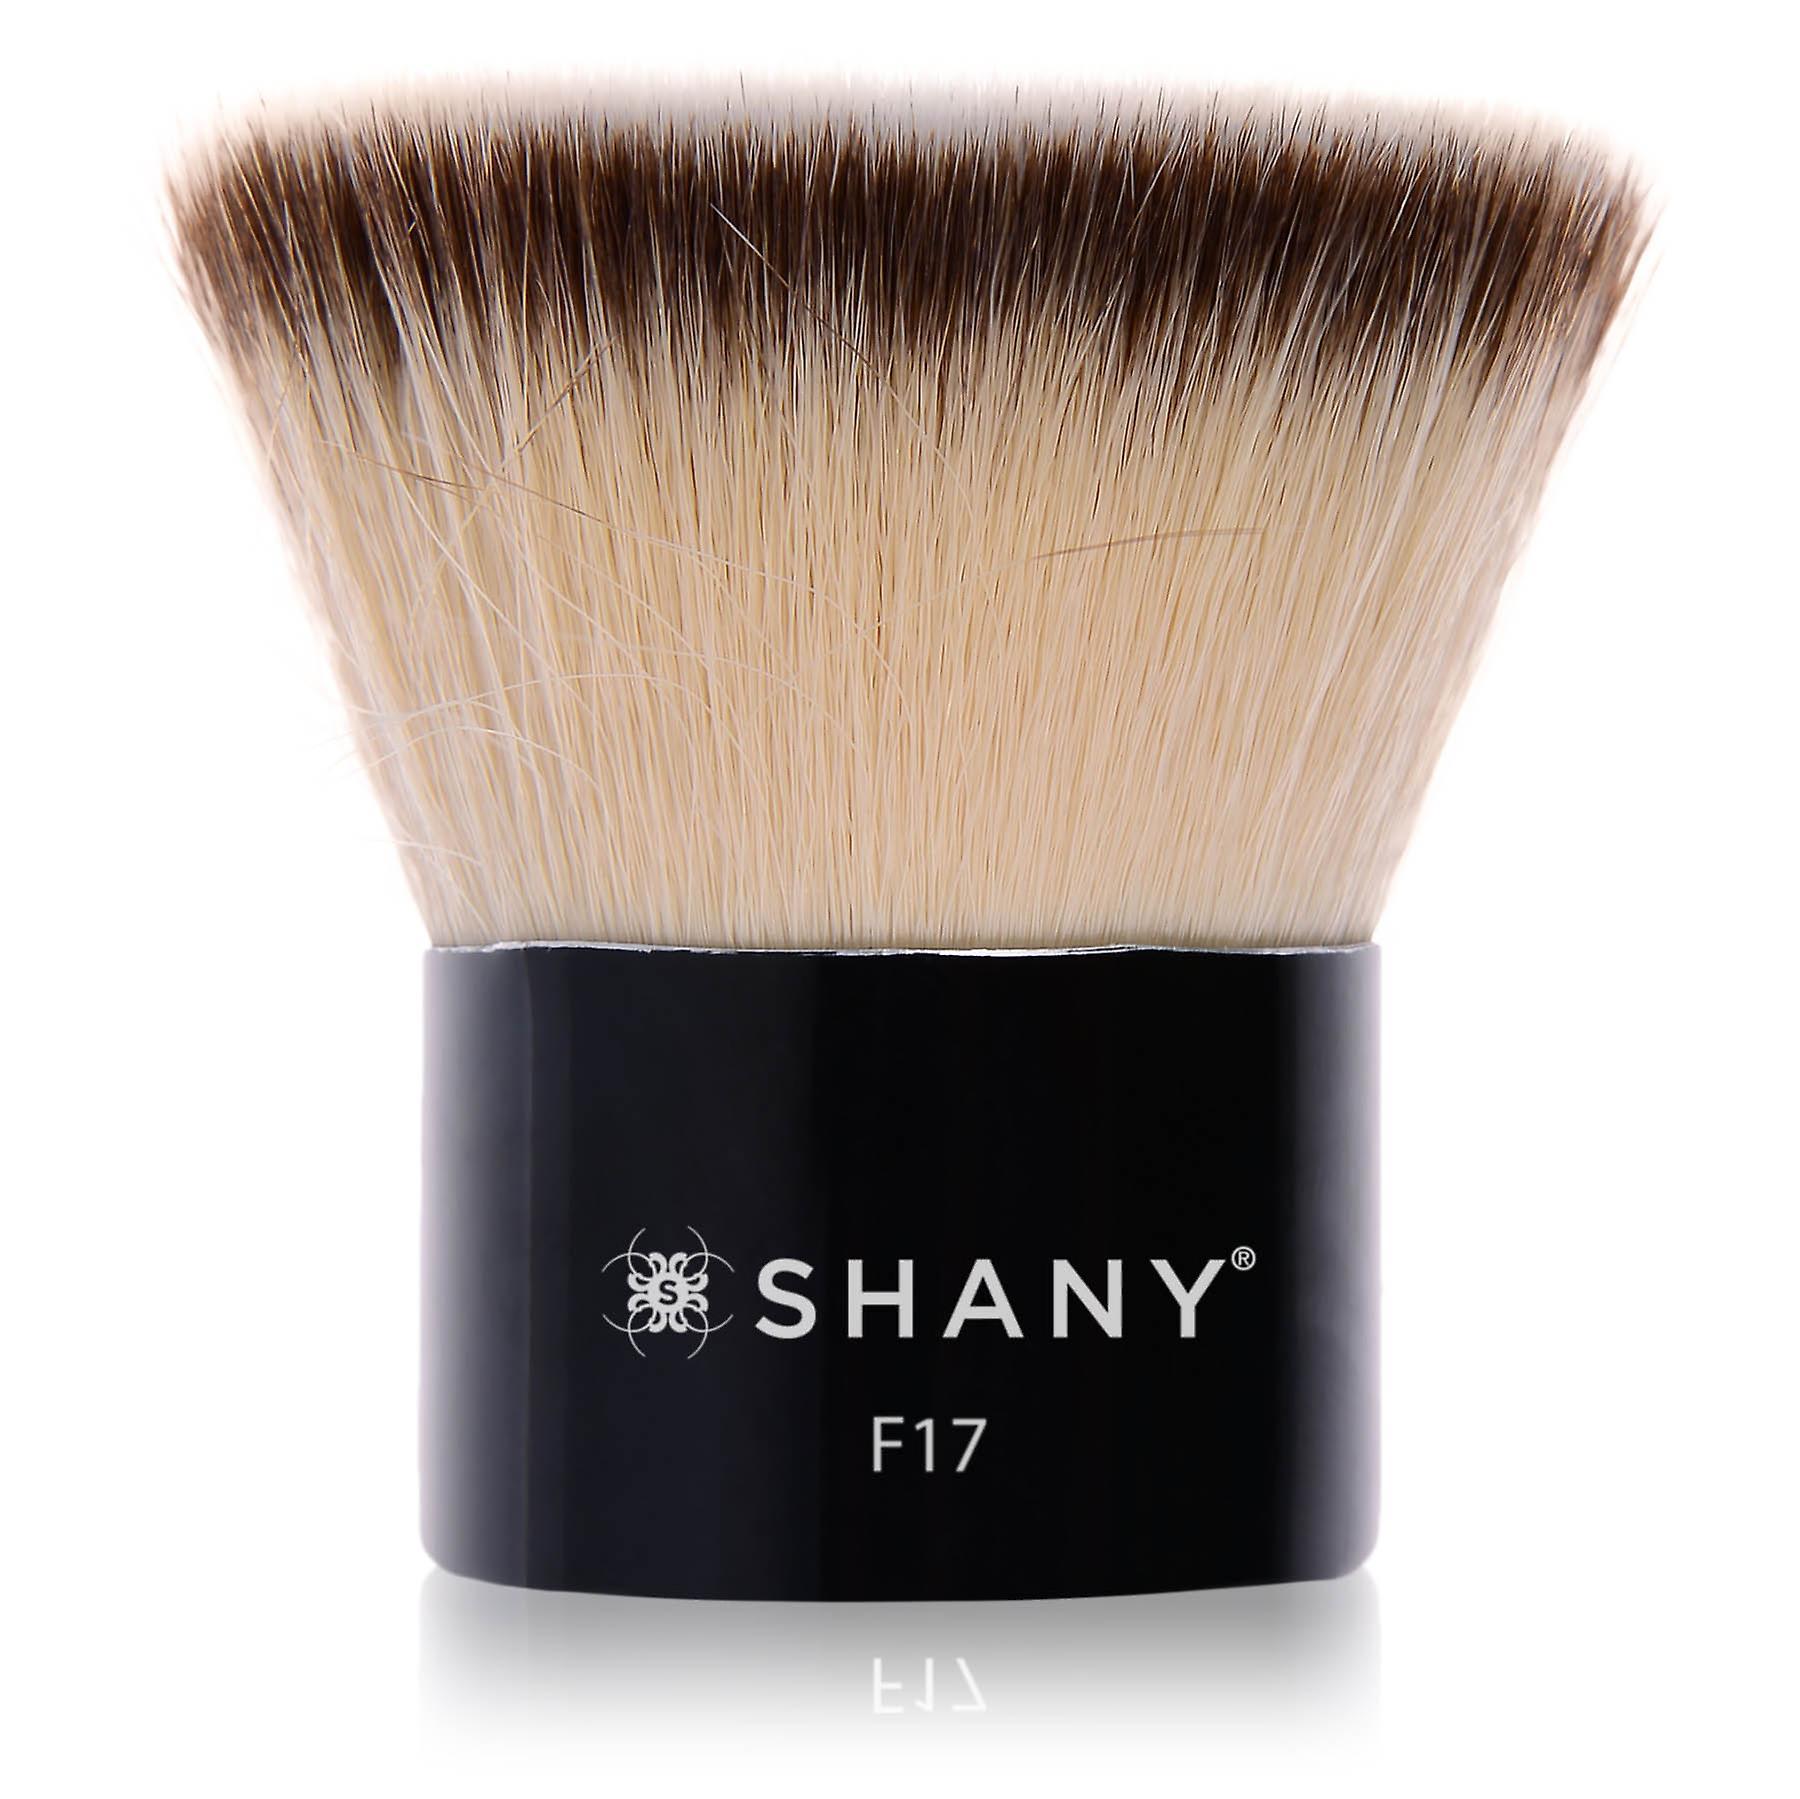 SHANY Master Kabuki – Powder and Highlighter - Perfect for Contouring